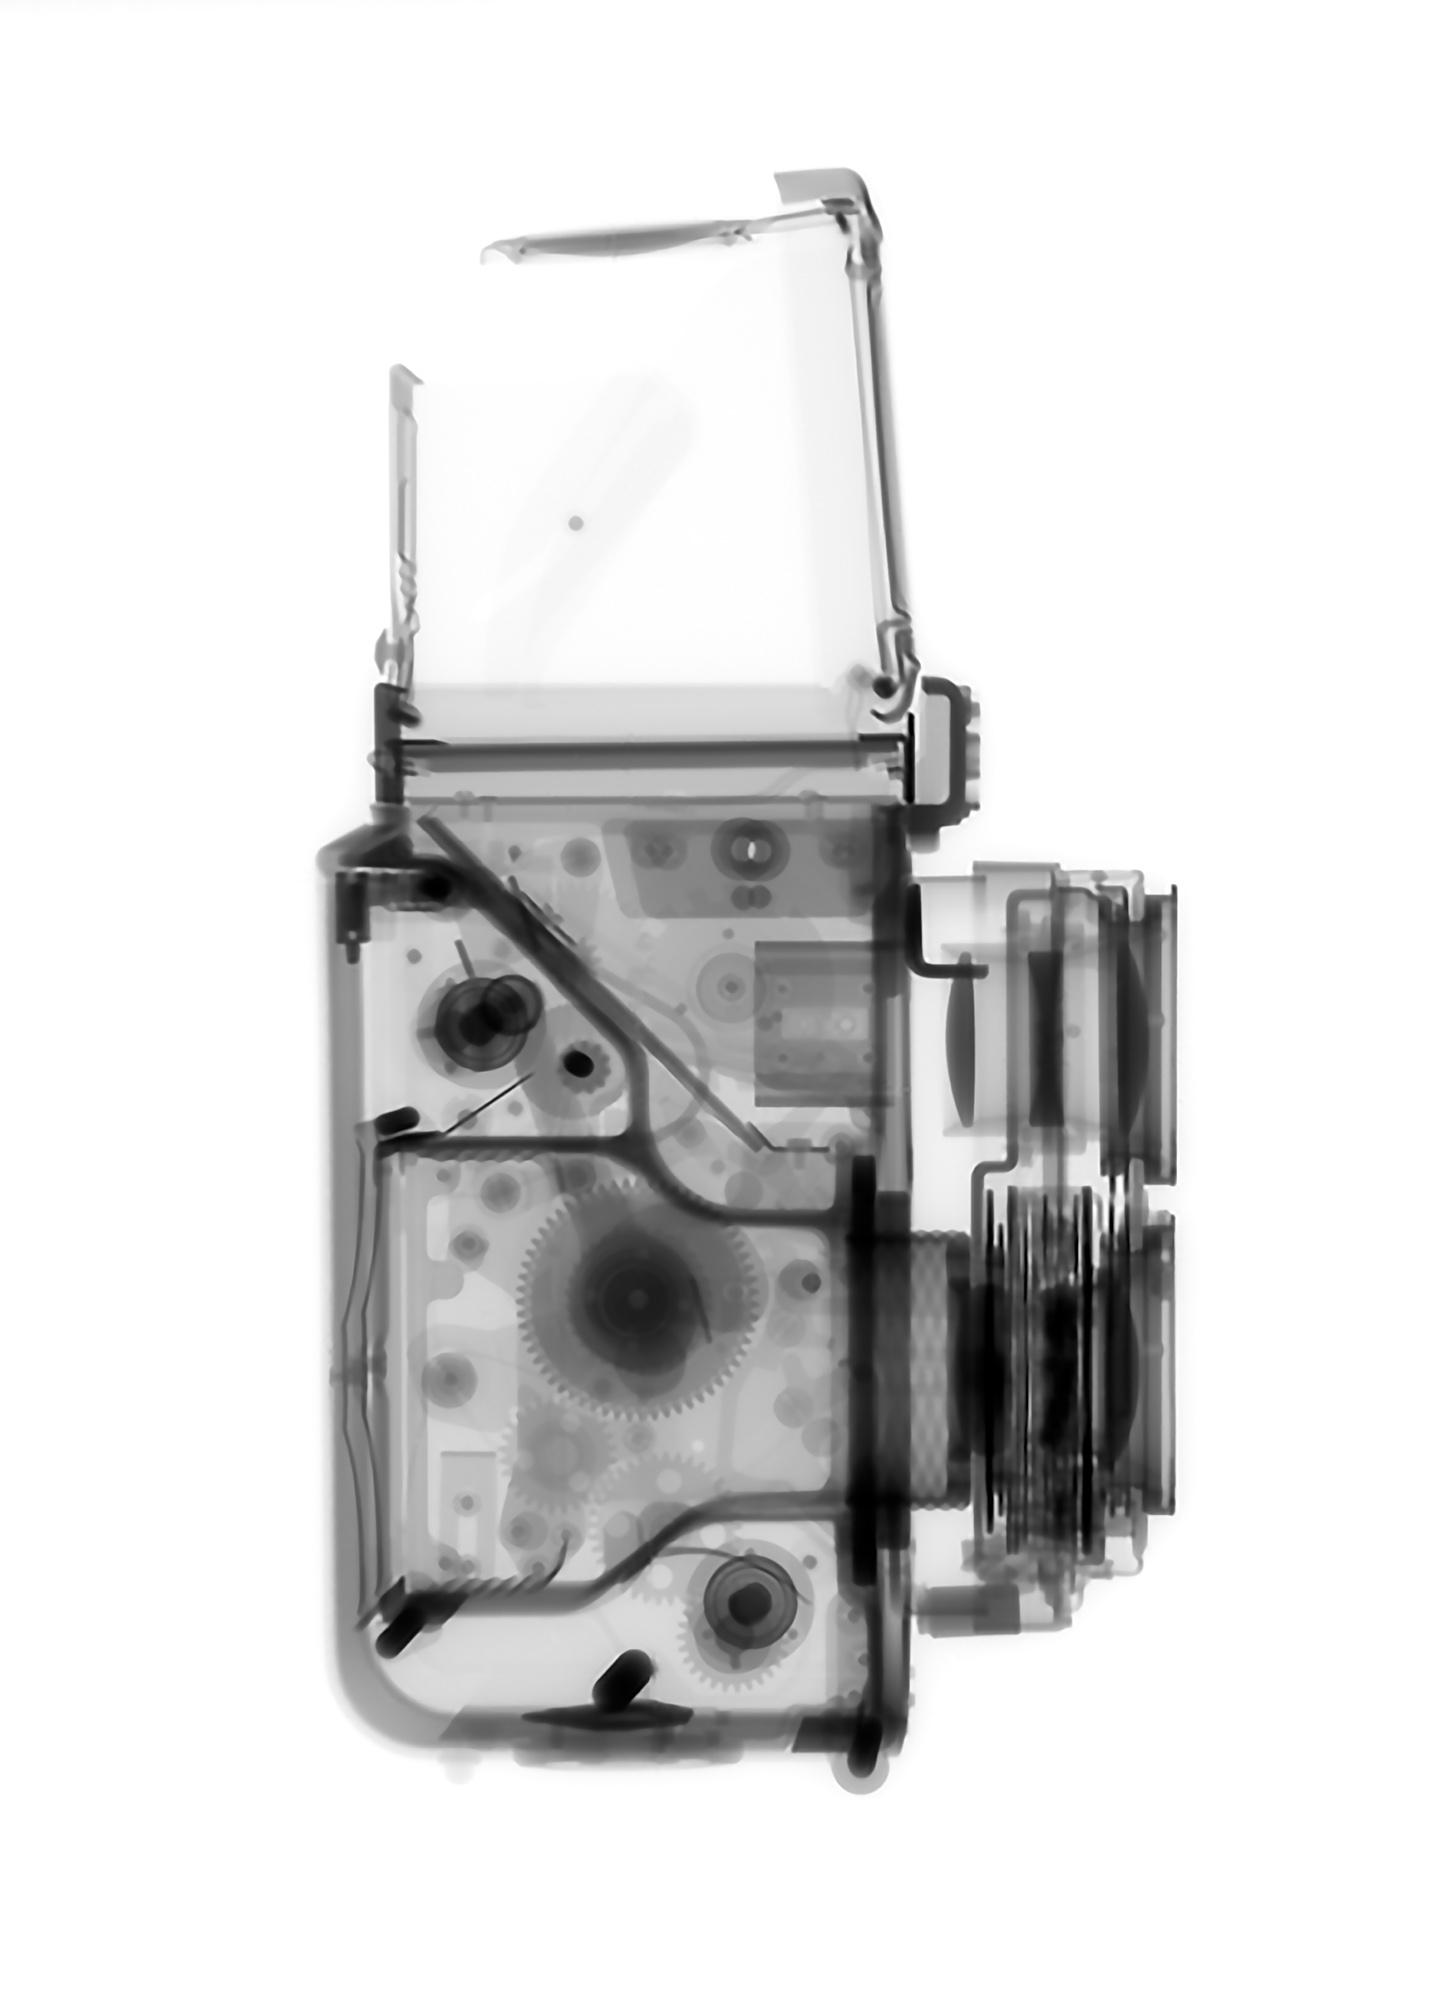 Minolta Autocord I